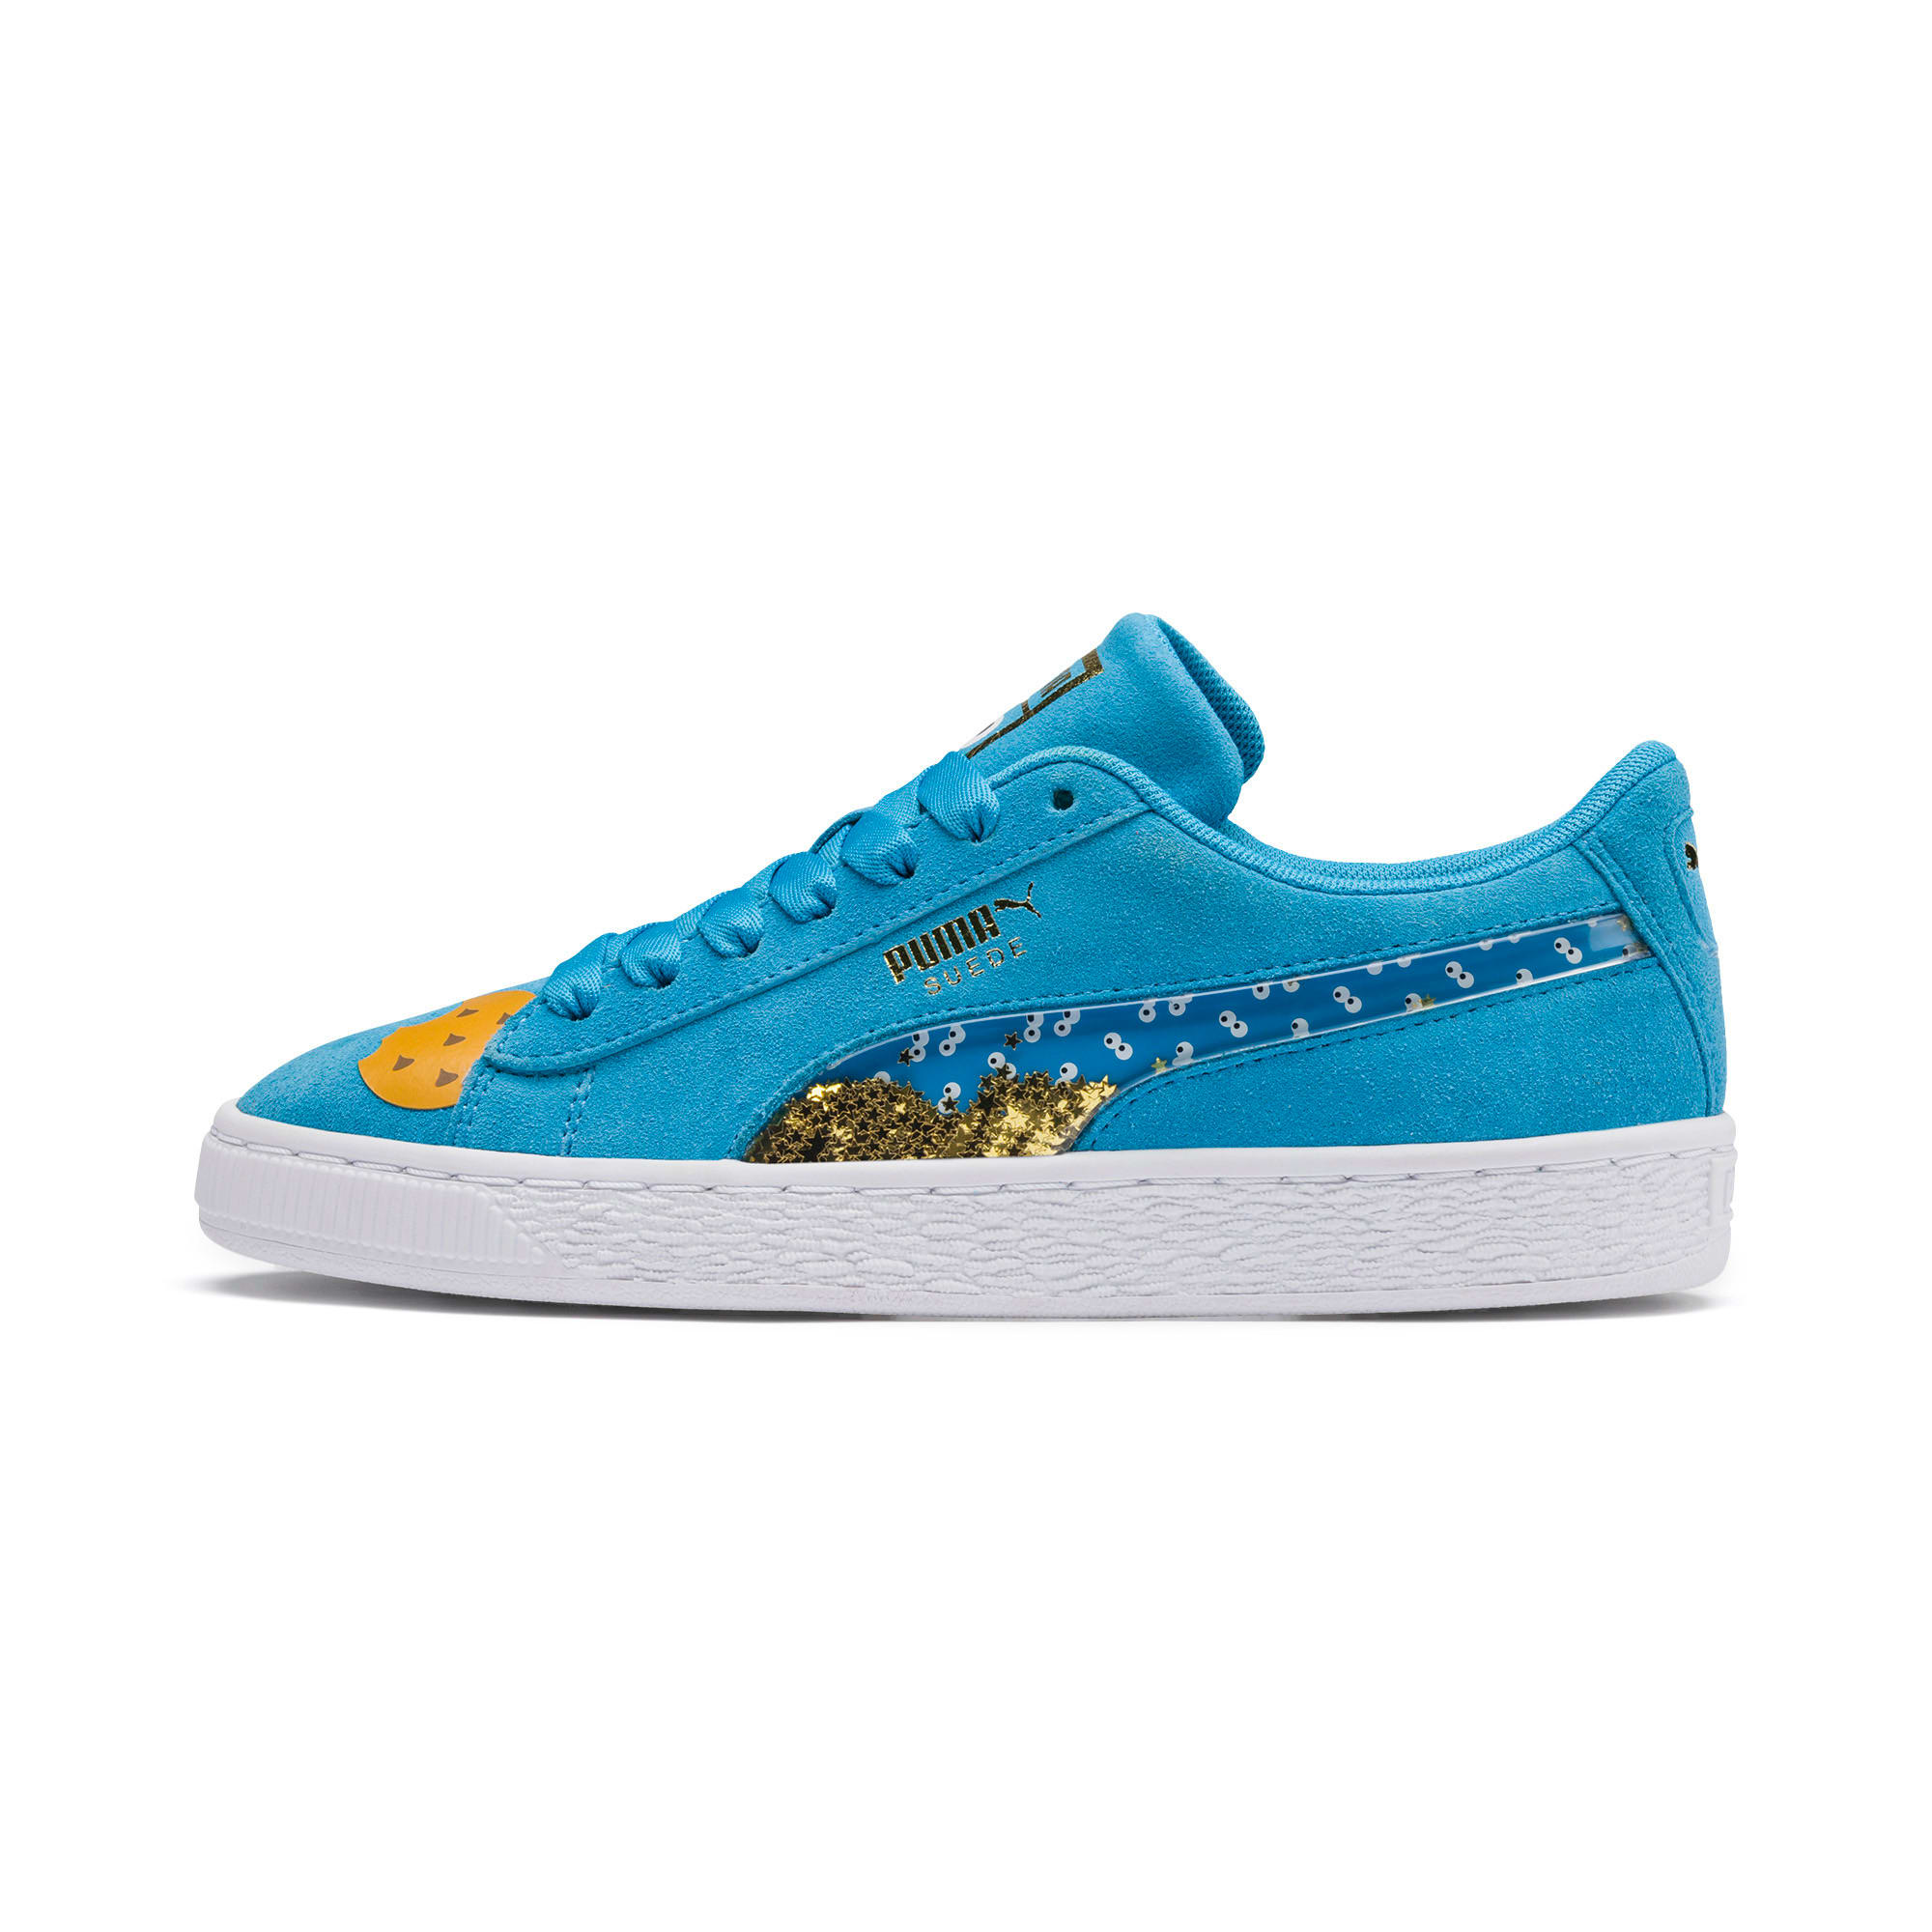 Thumbnail 1 of PUMA x SESAME STREET 50 Suede Statement Sneakers JR, Bleu Azur-Puma White, medium